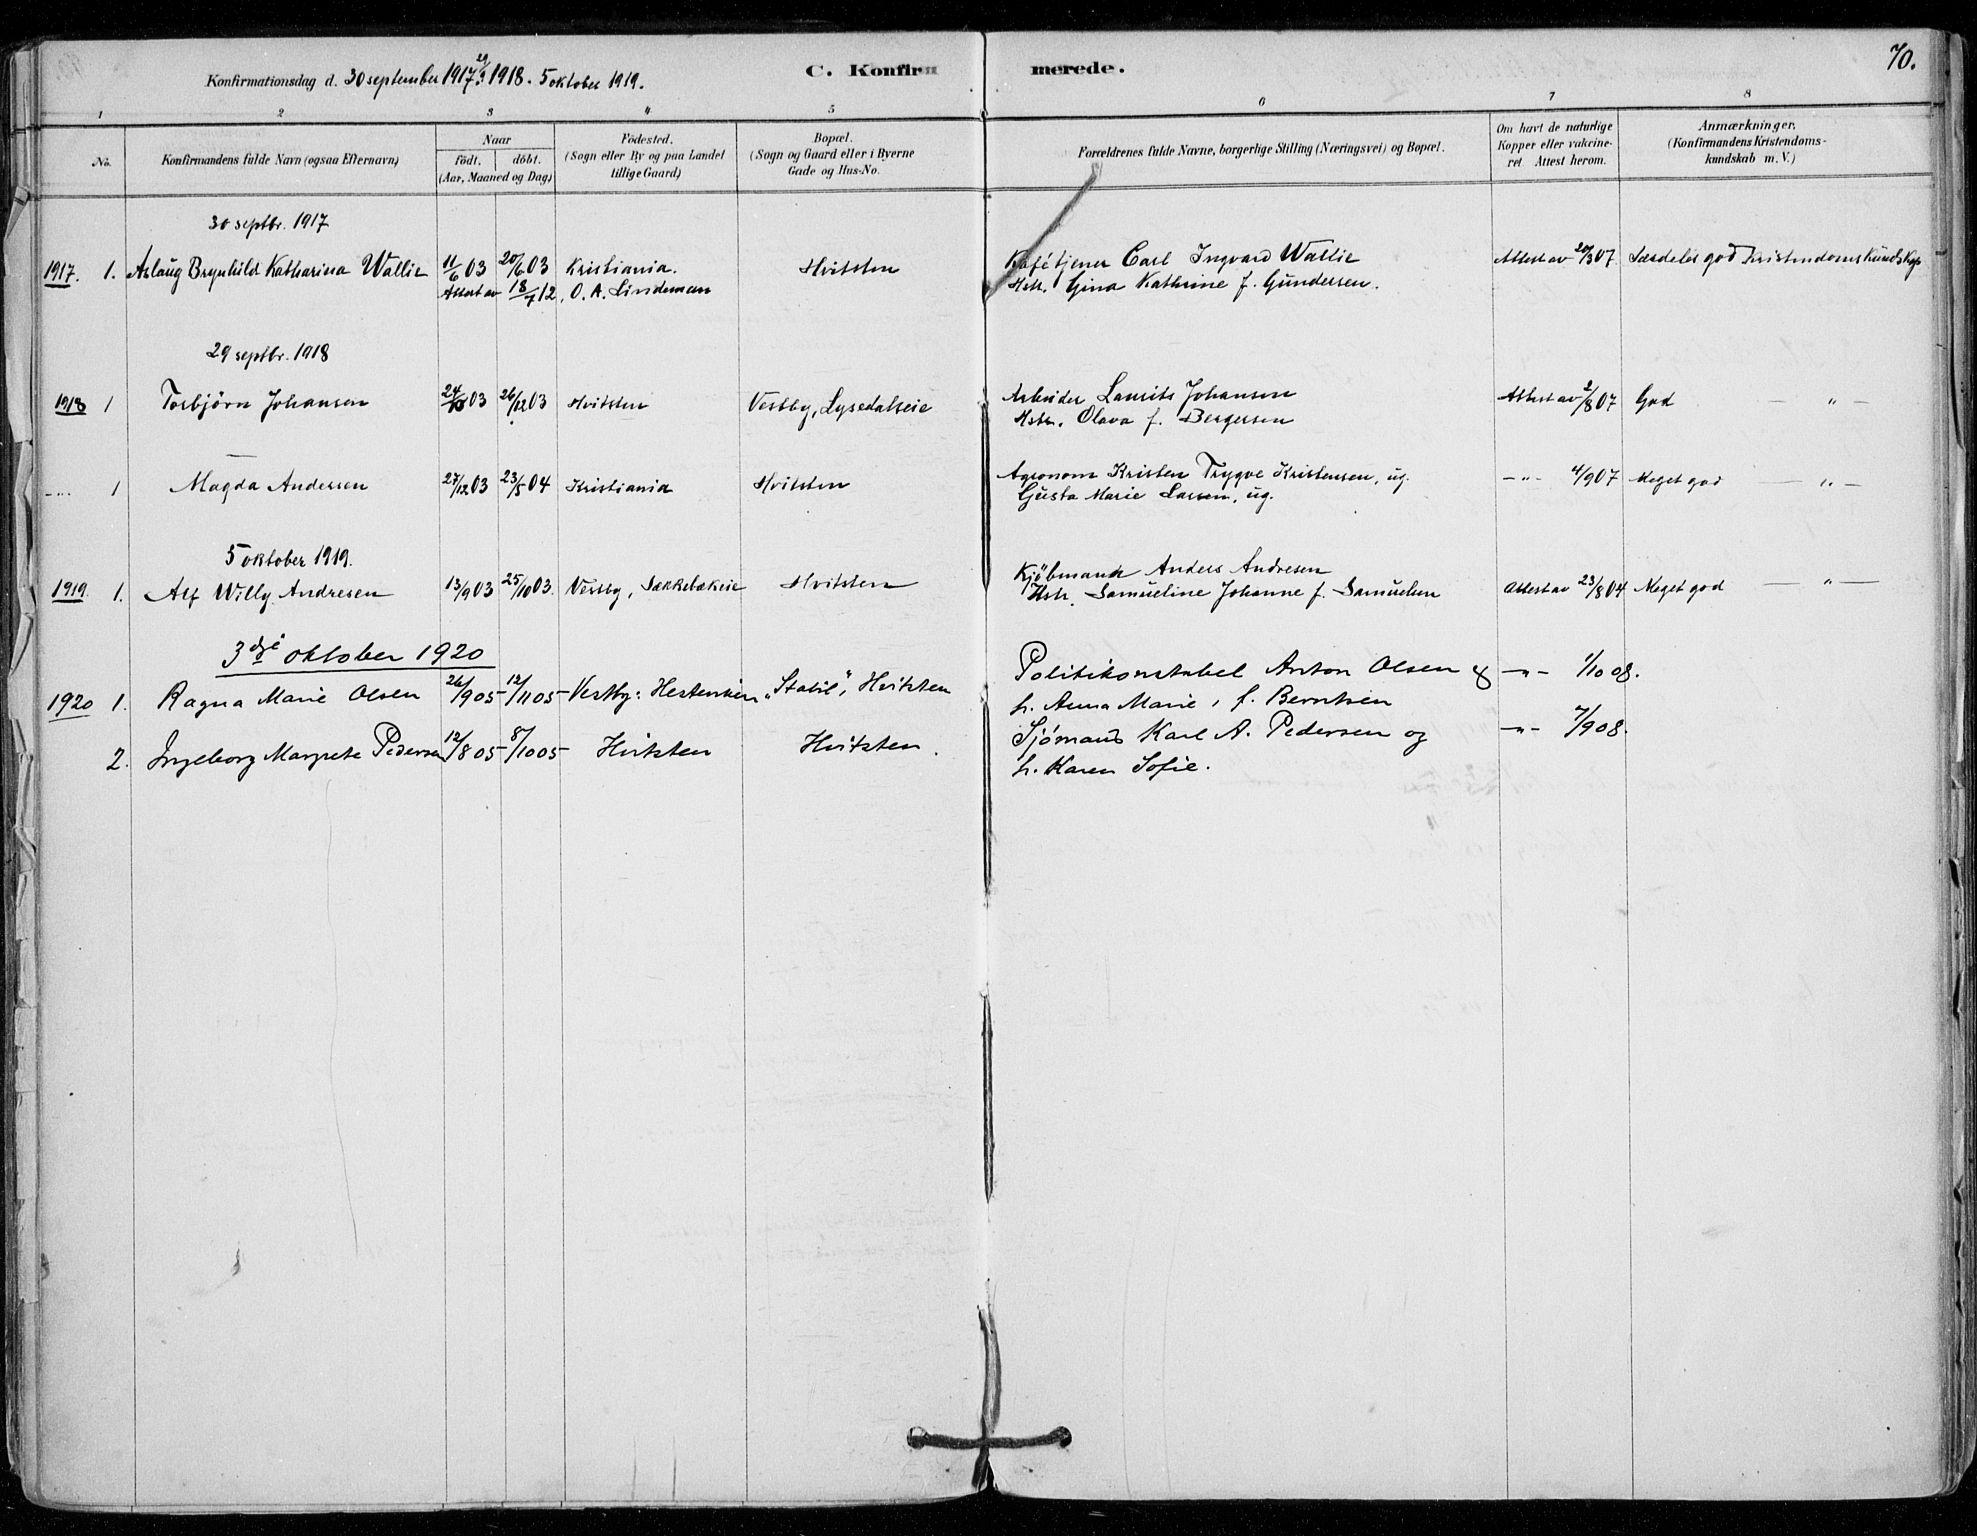 SAO, Vestby prestekontor Kirkebøker, F/Fd/L0001: Ministerialbok nr. IV 1, 1878-1945, s. 70